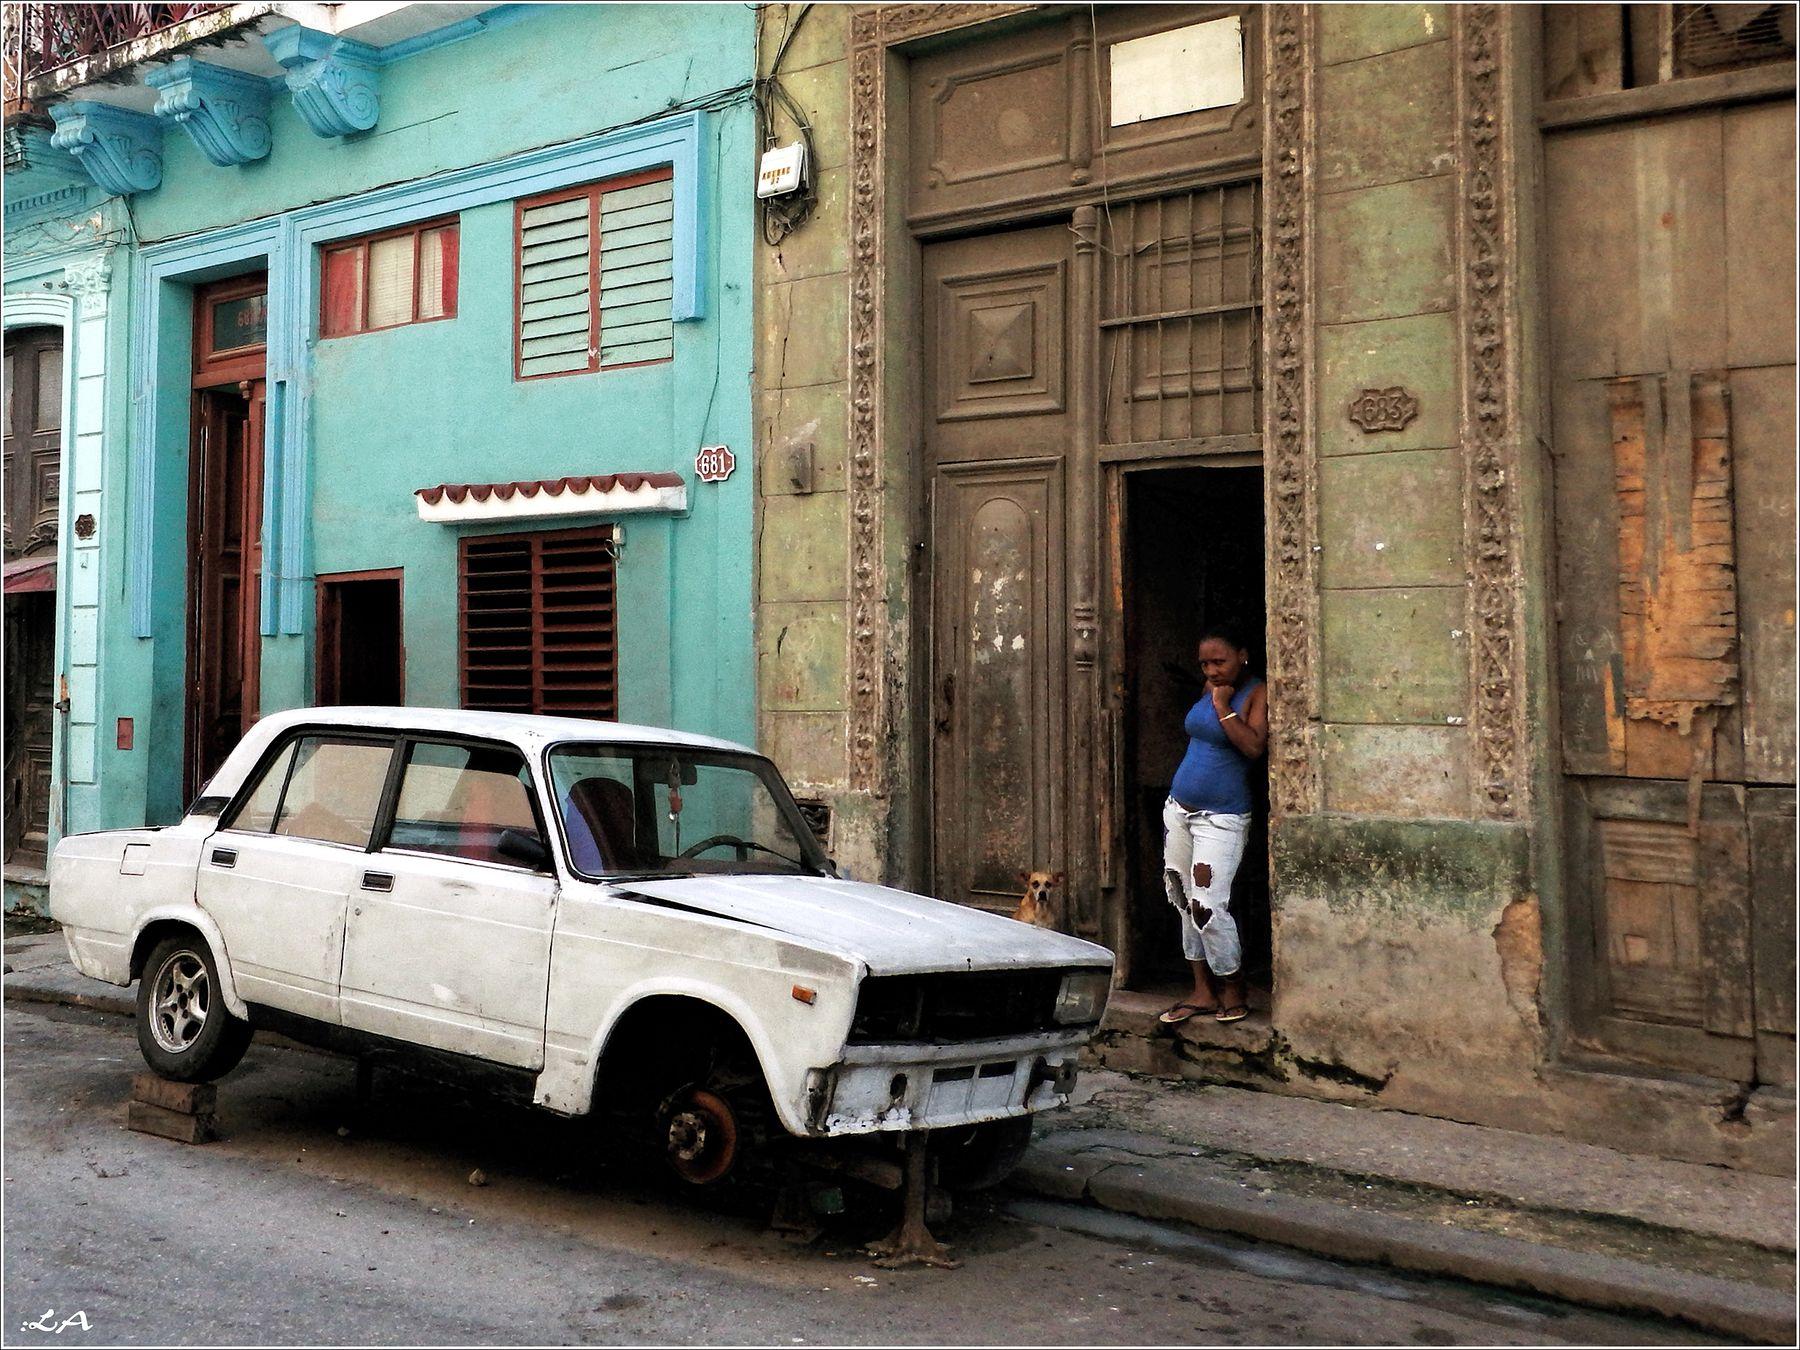 *И Белый Автомобиль у порога...* фотография путешествия Гавана центр улица жанр автомобиль Фото.Сайт Светлана Мамакина Lihgra Adventure